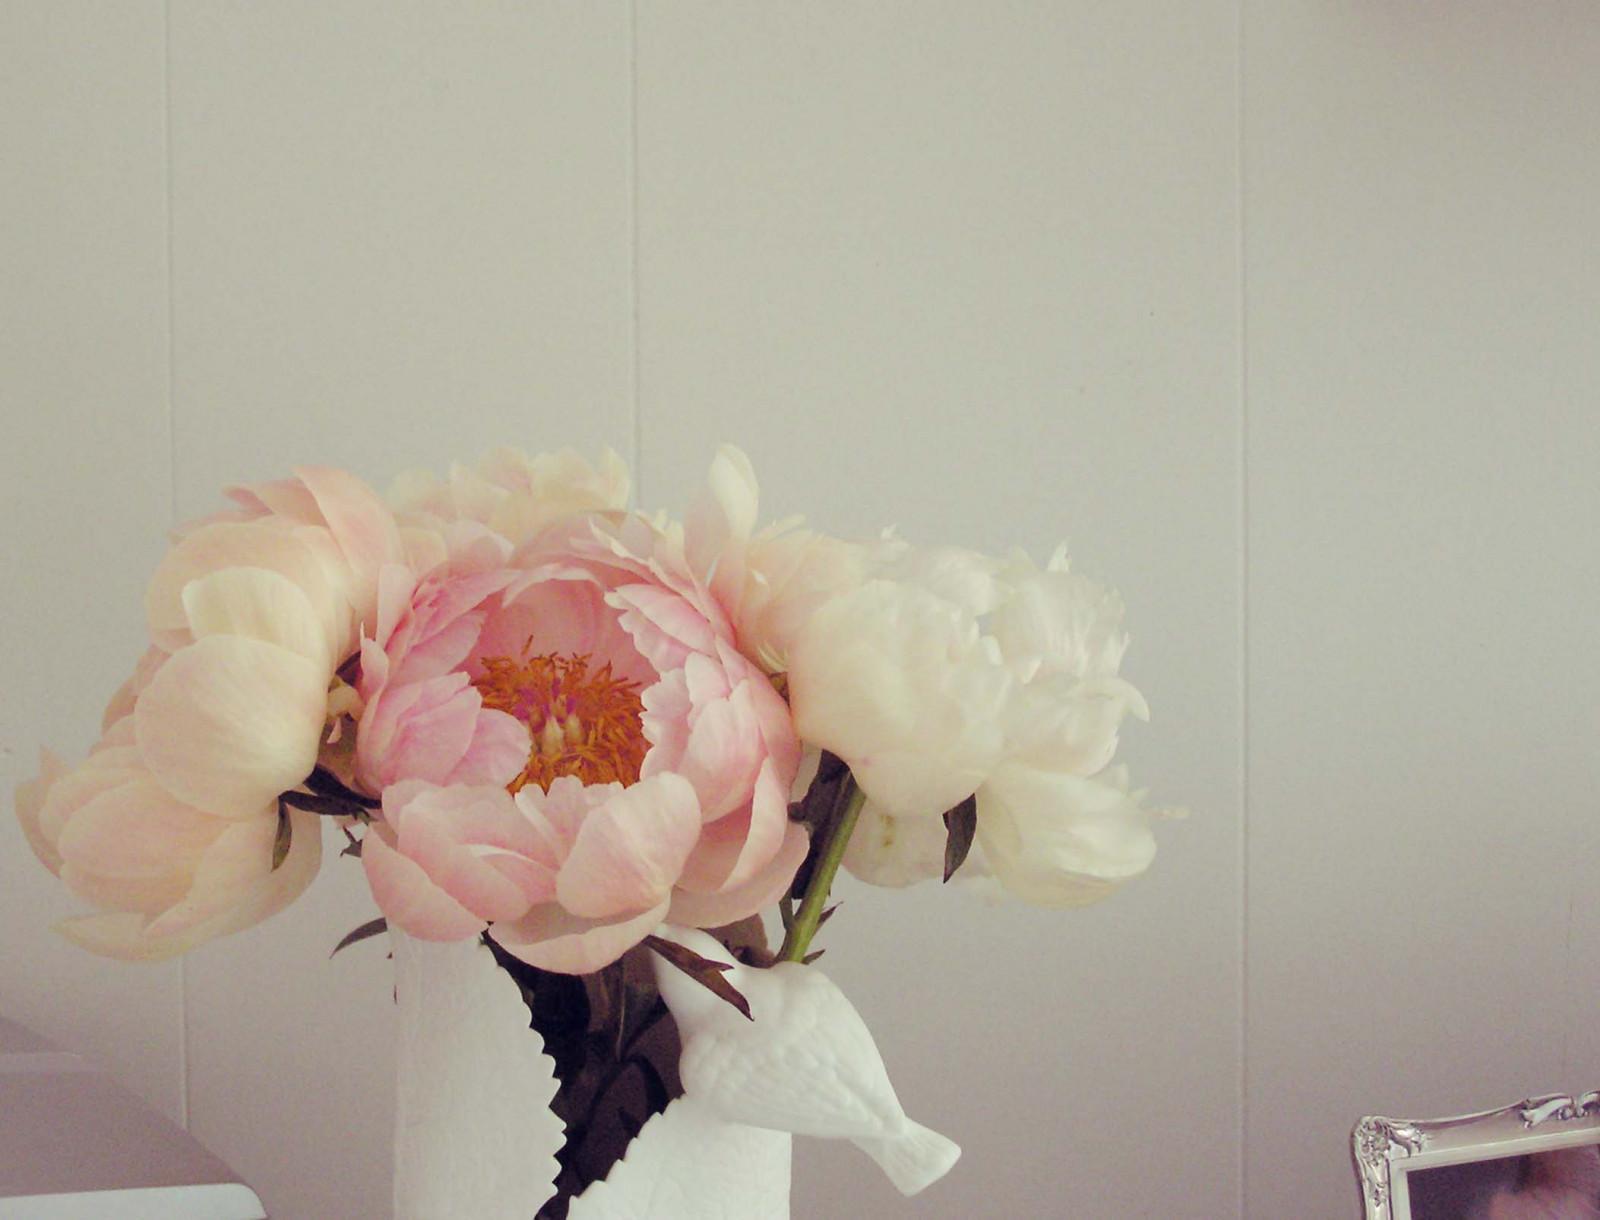 Fondos de pantalla : blanco, Flores, pared, casa, marco, rosado ...